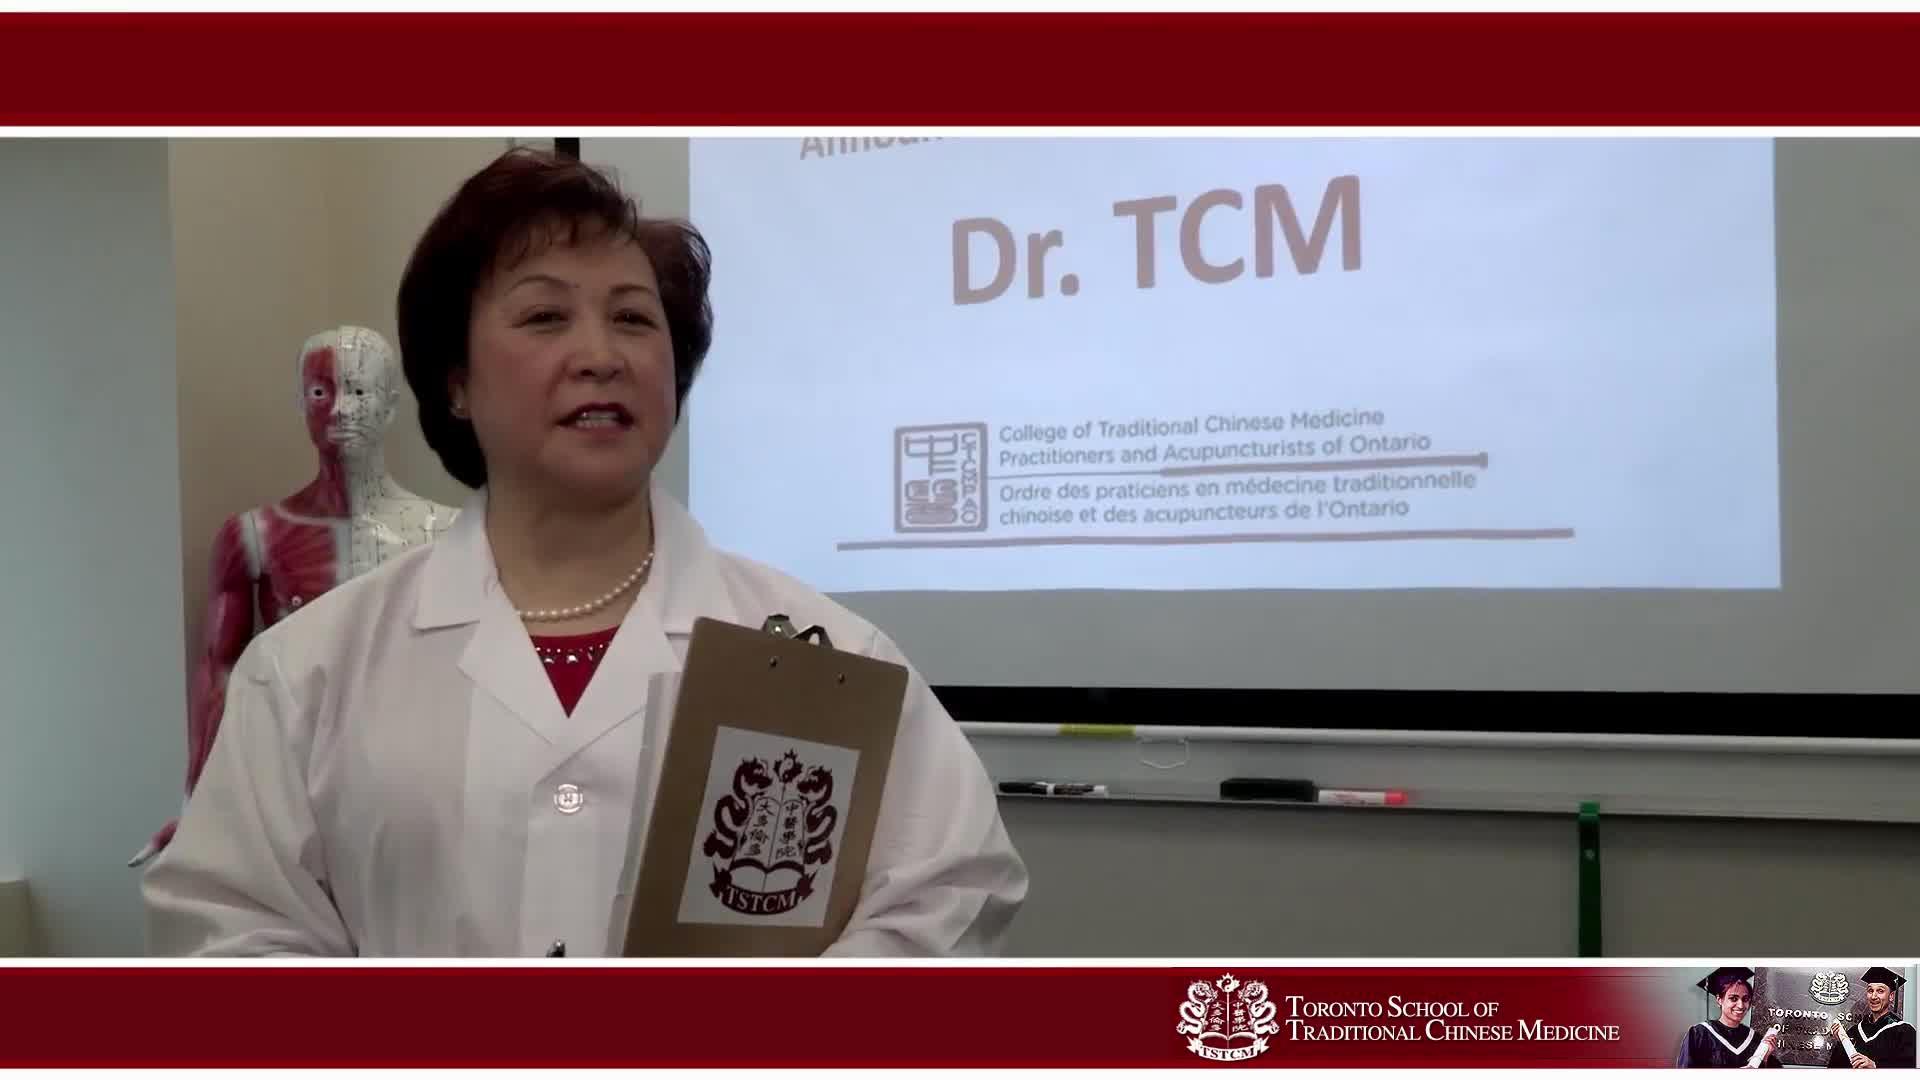 Toronto School of Traditional Chinese Medicine - Post-Secondary Schools - 4167829682